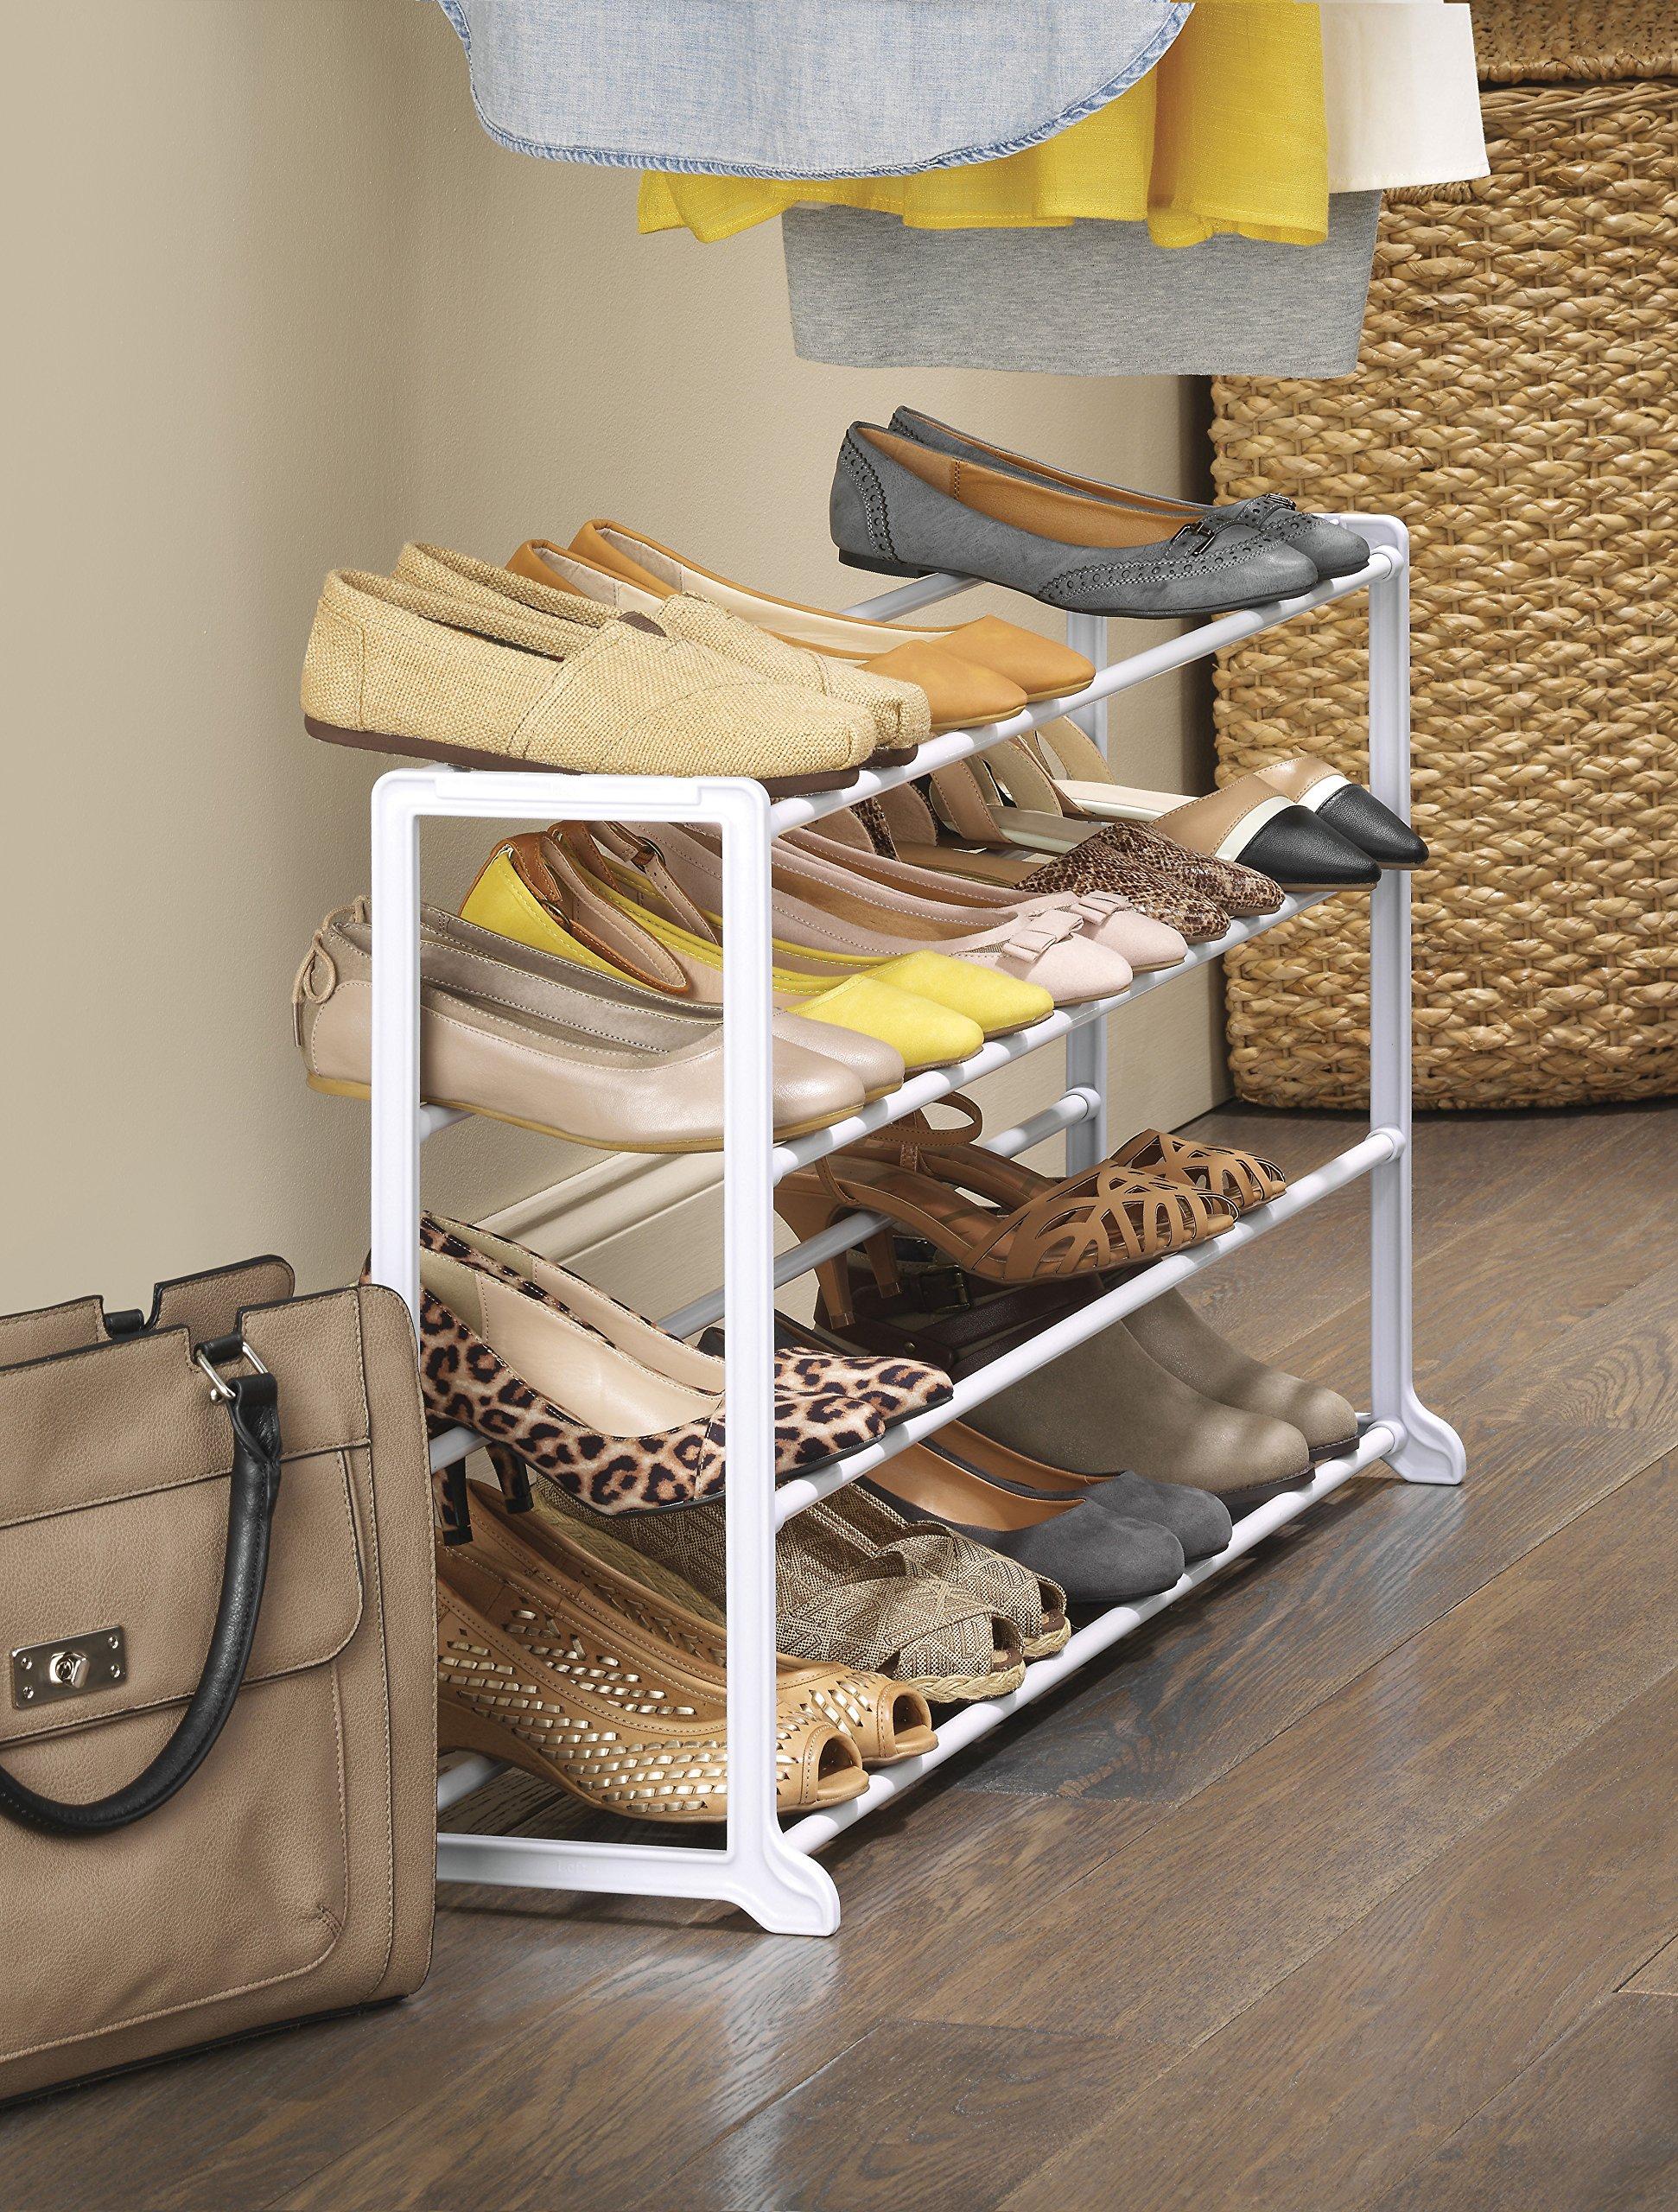 Whitmor 20 pair floor shoe rack white prodotalk for Muebles para acomodar zapatos